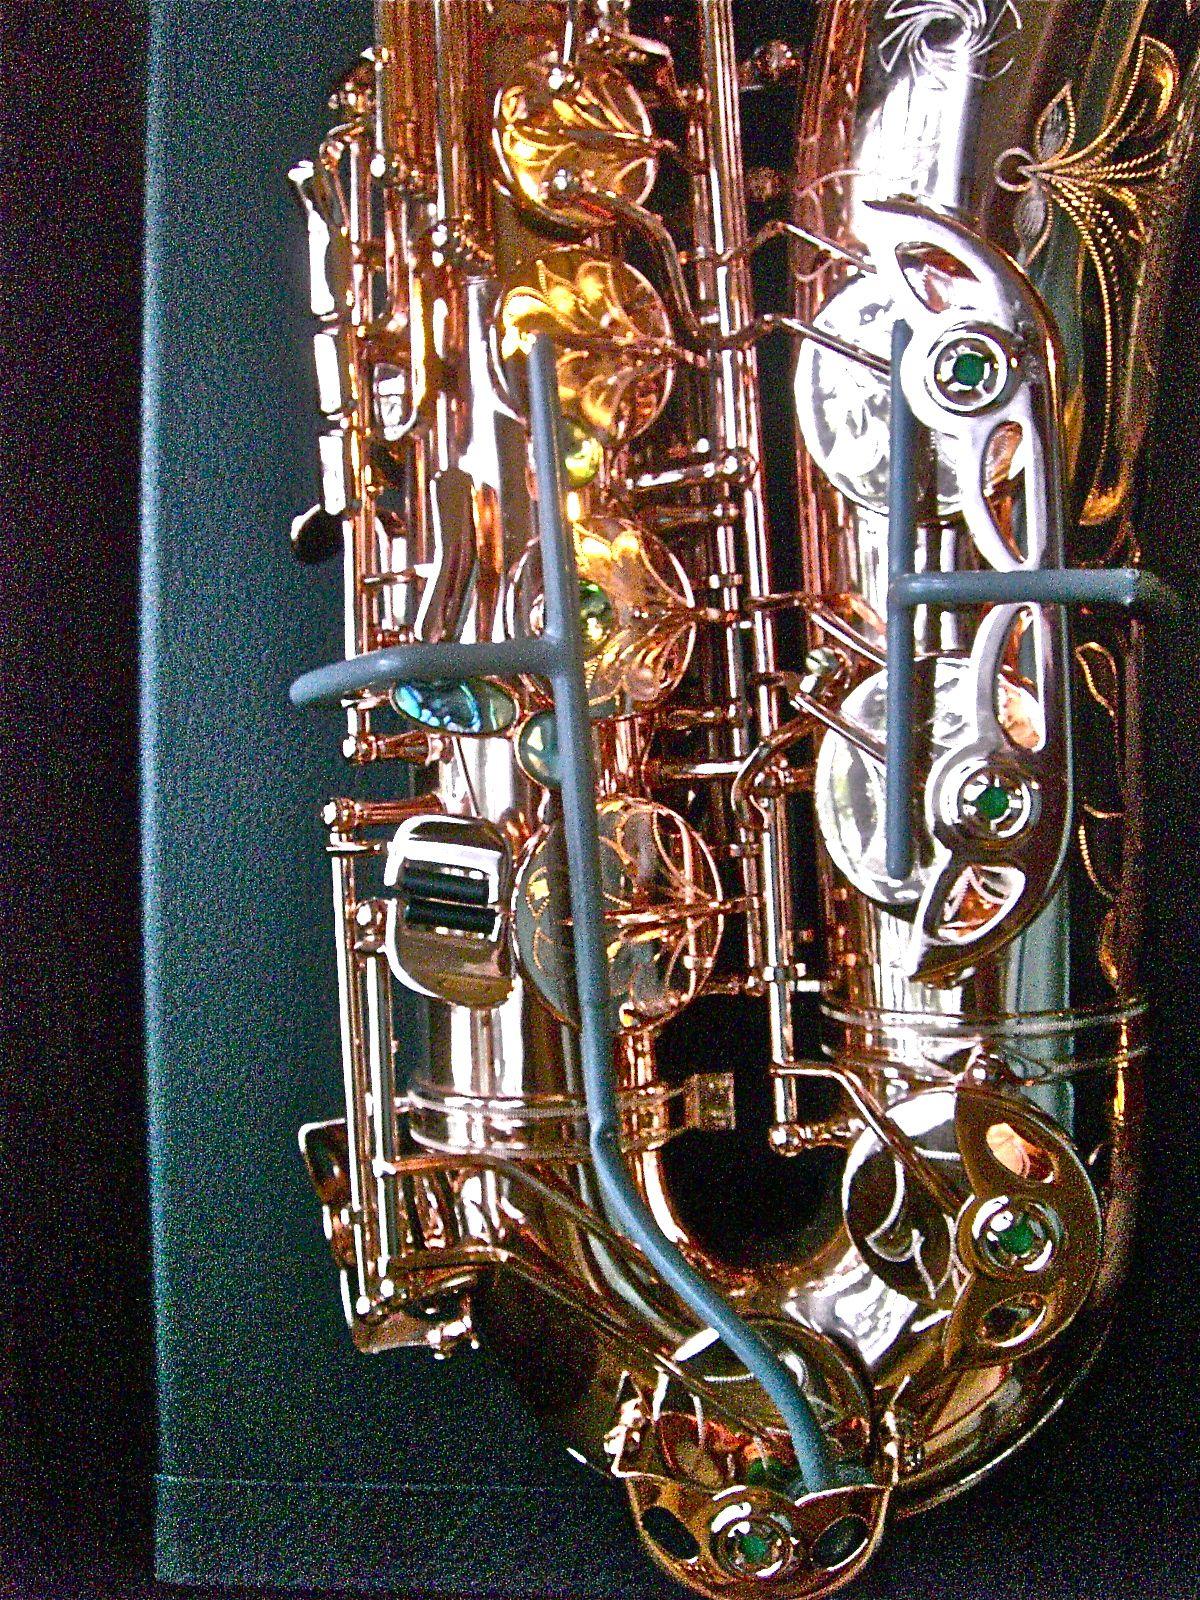 Mistress Sharon S Tenor Saxophone Key Clamps Steve